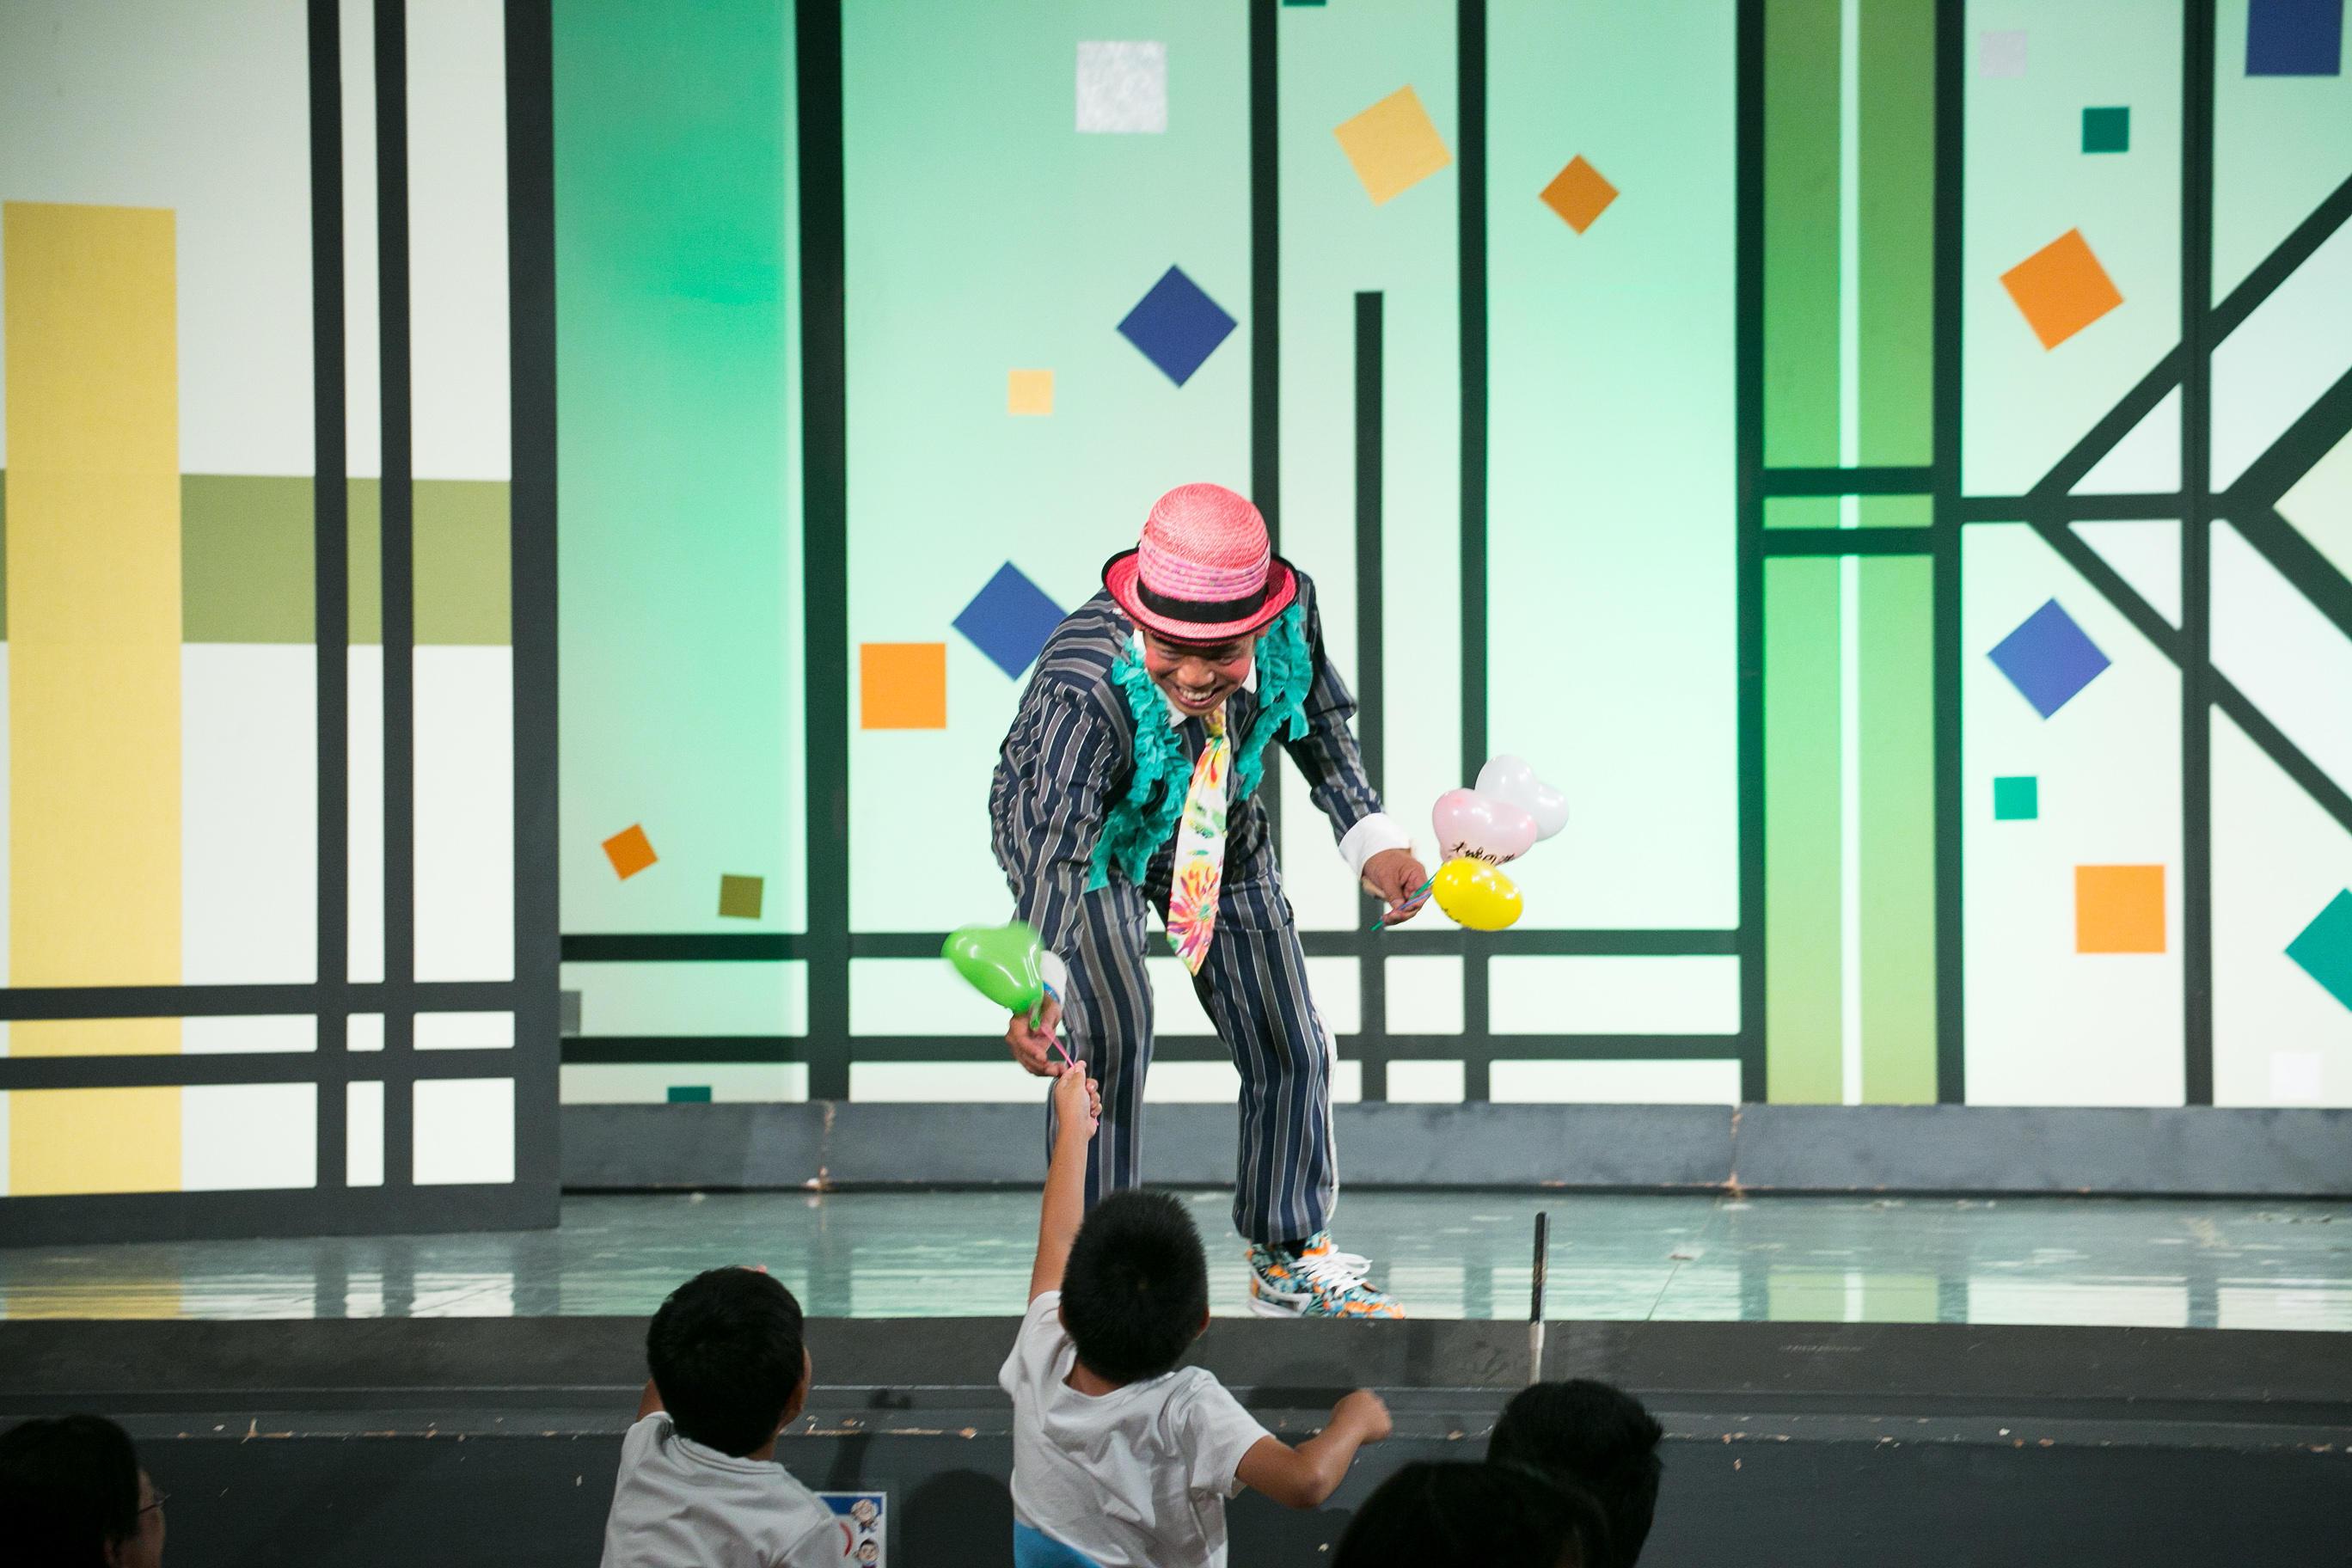 http://news.yoshimoto.co.jp/20180724223832-27fb0aad92b610160220e52b336647ebfc8138f7.jpg